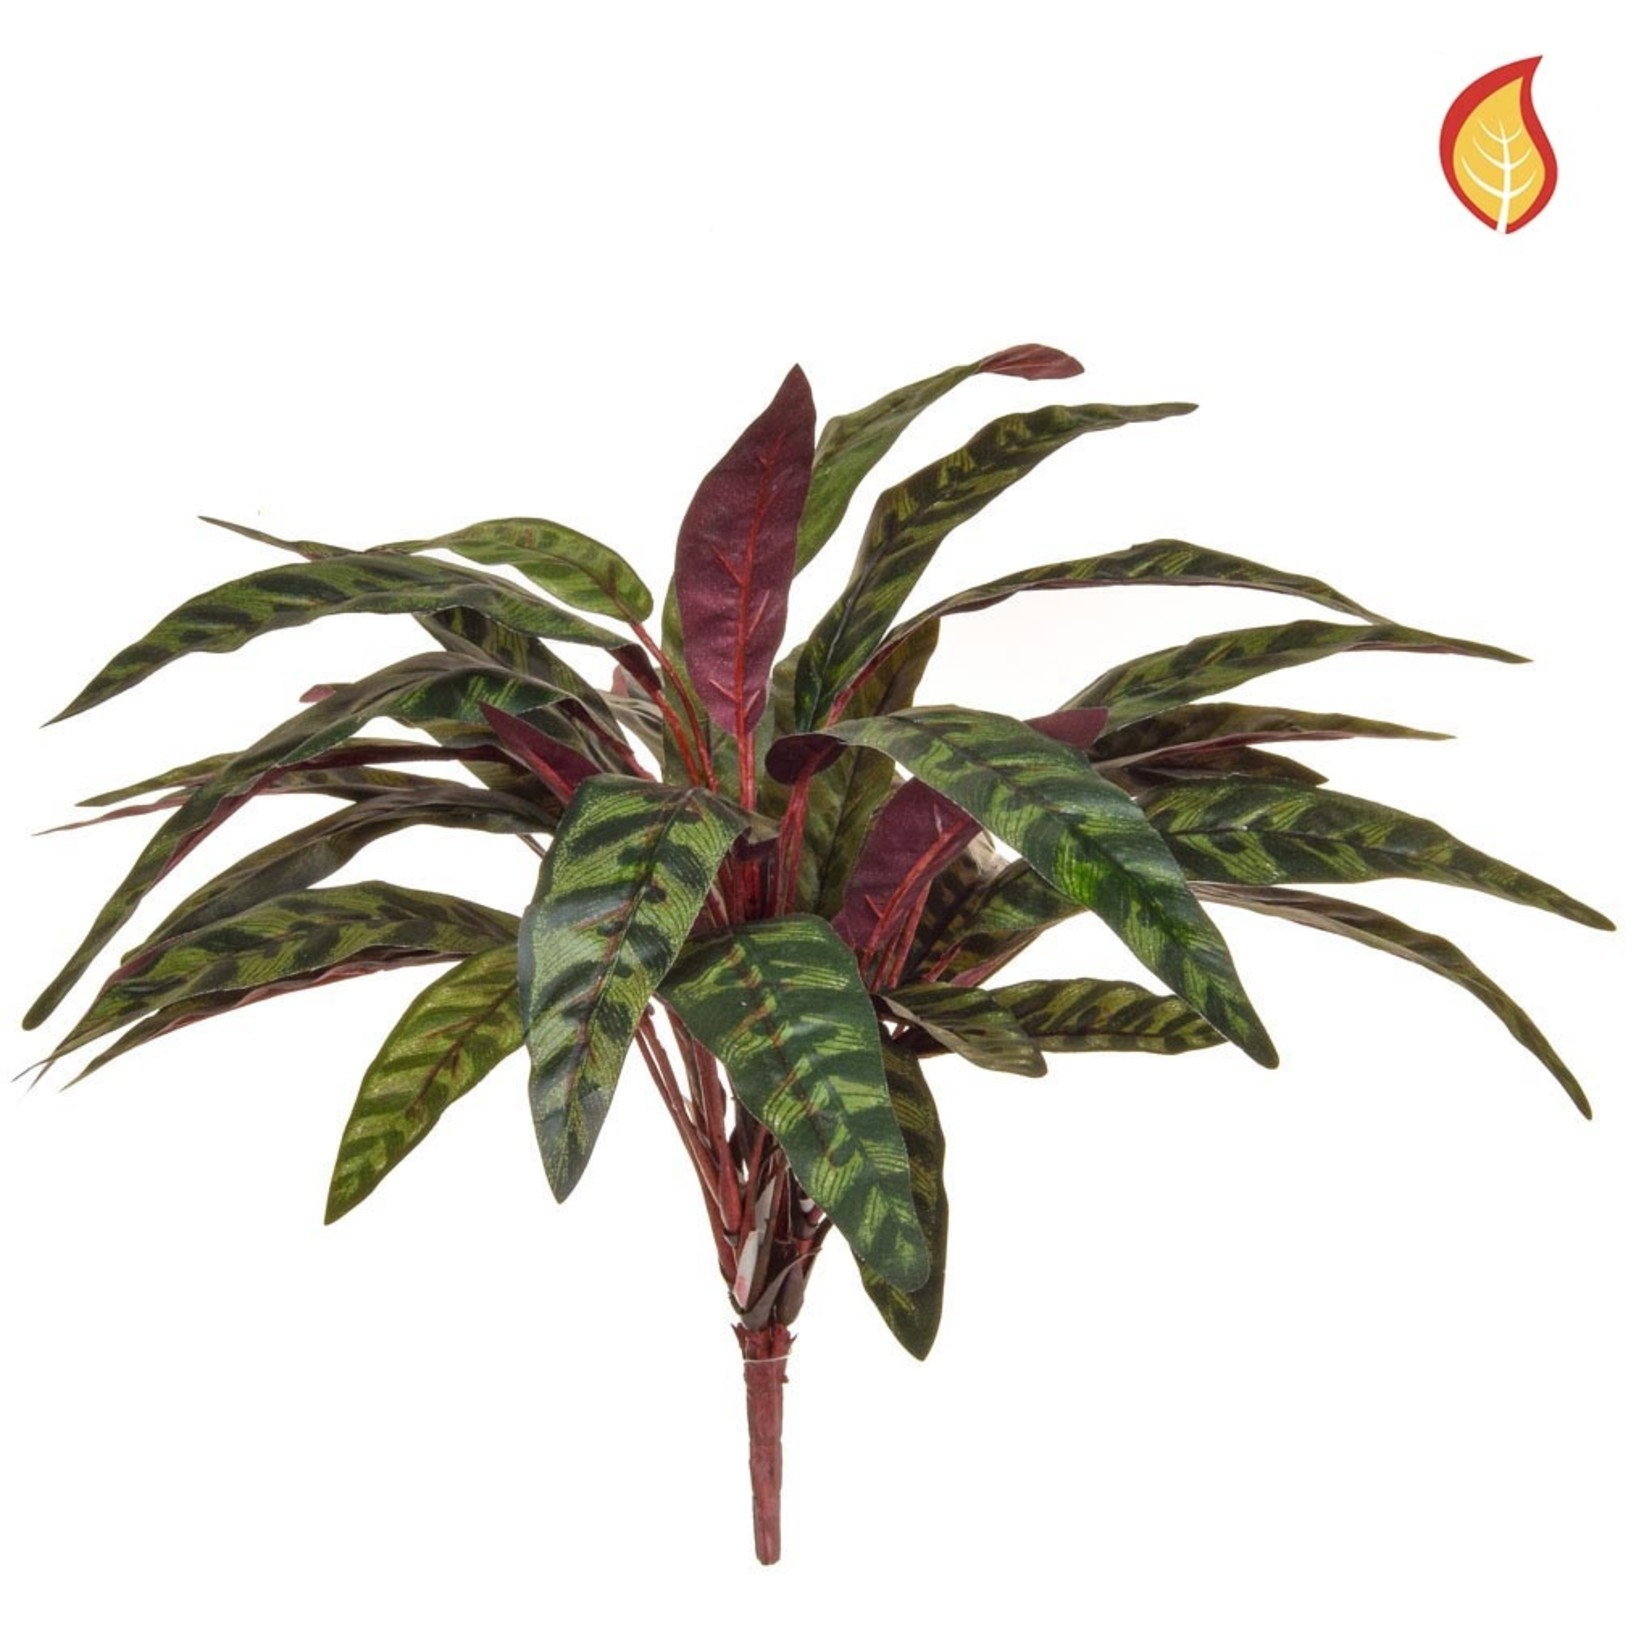 Plants Peacock Bush 45cm - Fire Rated